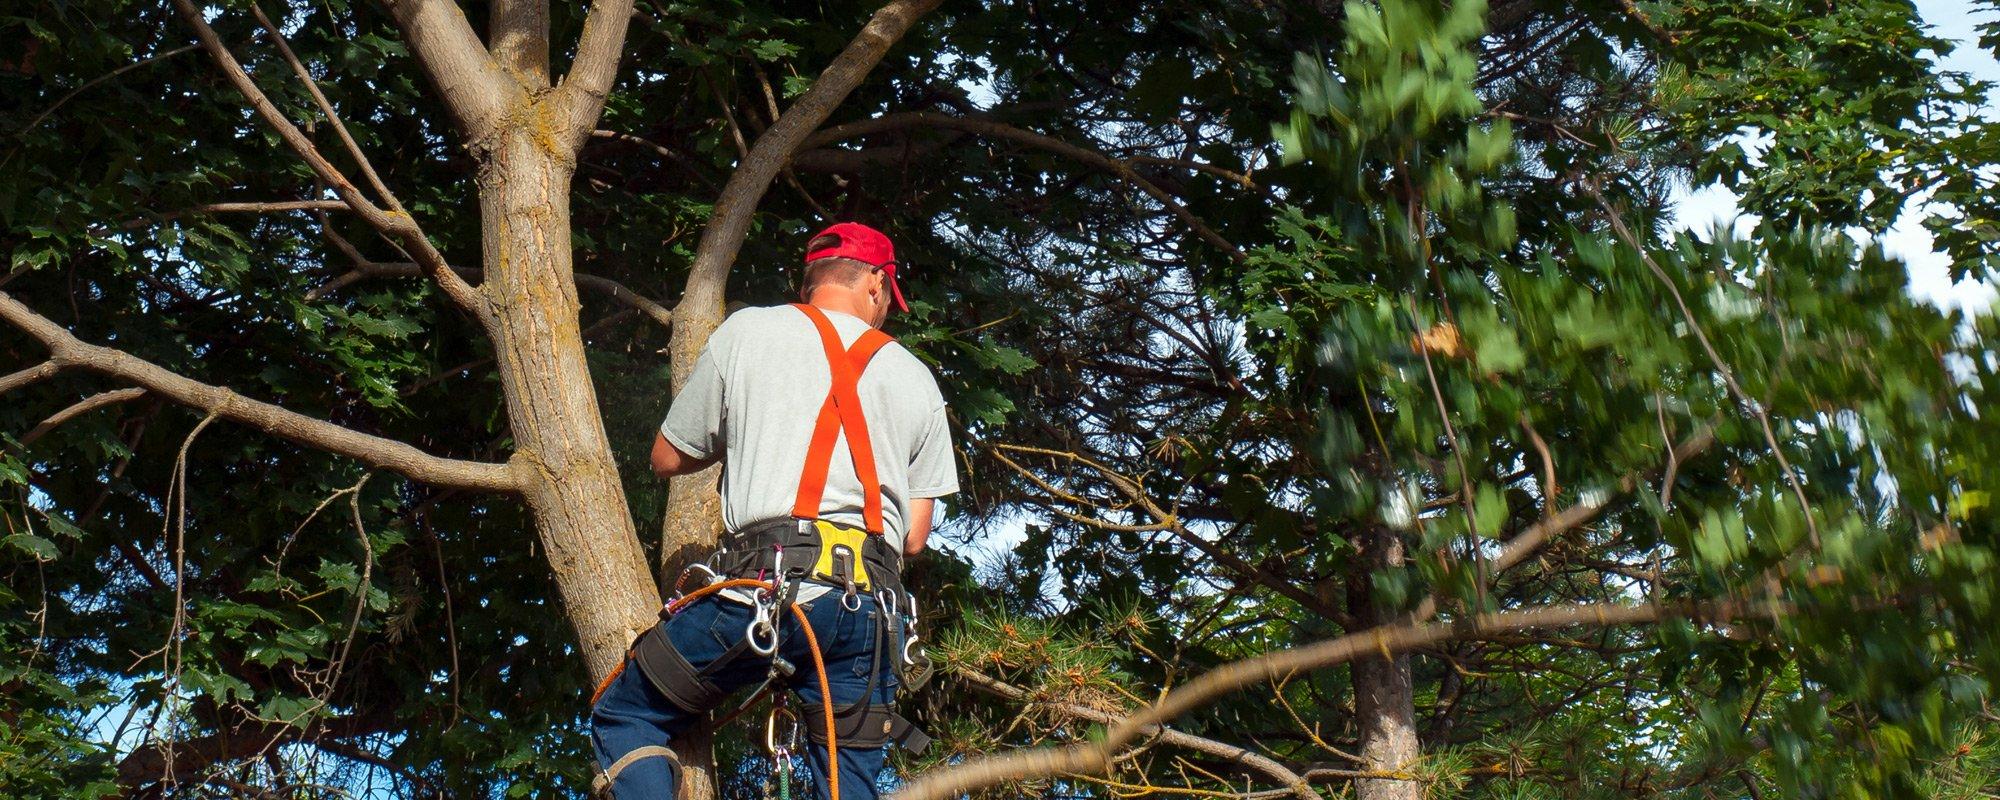 Professional cutting down a tree